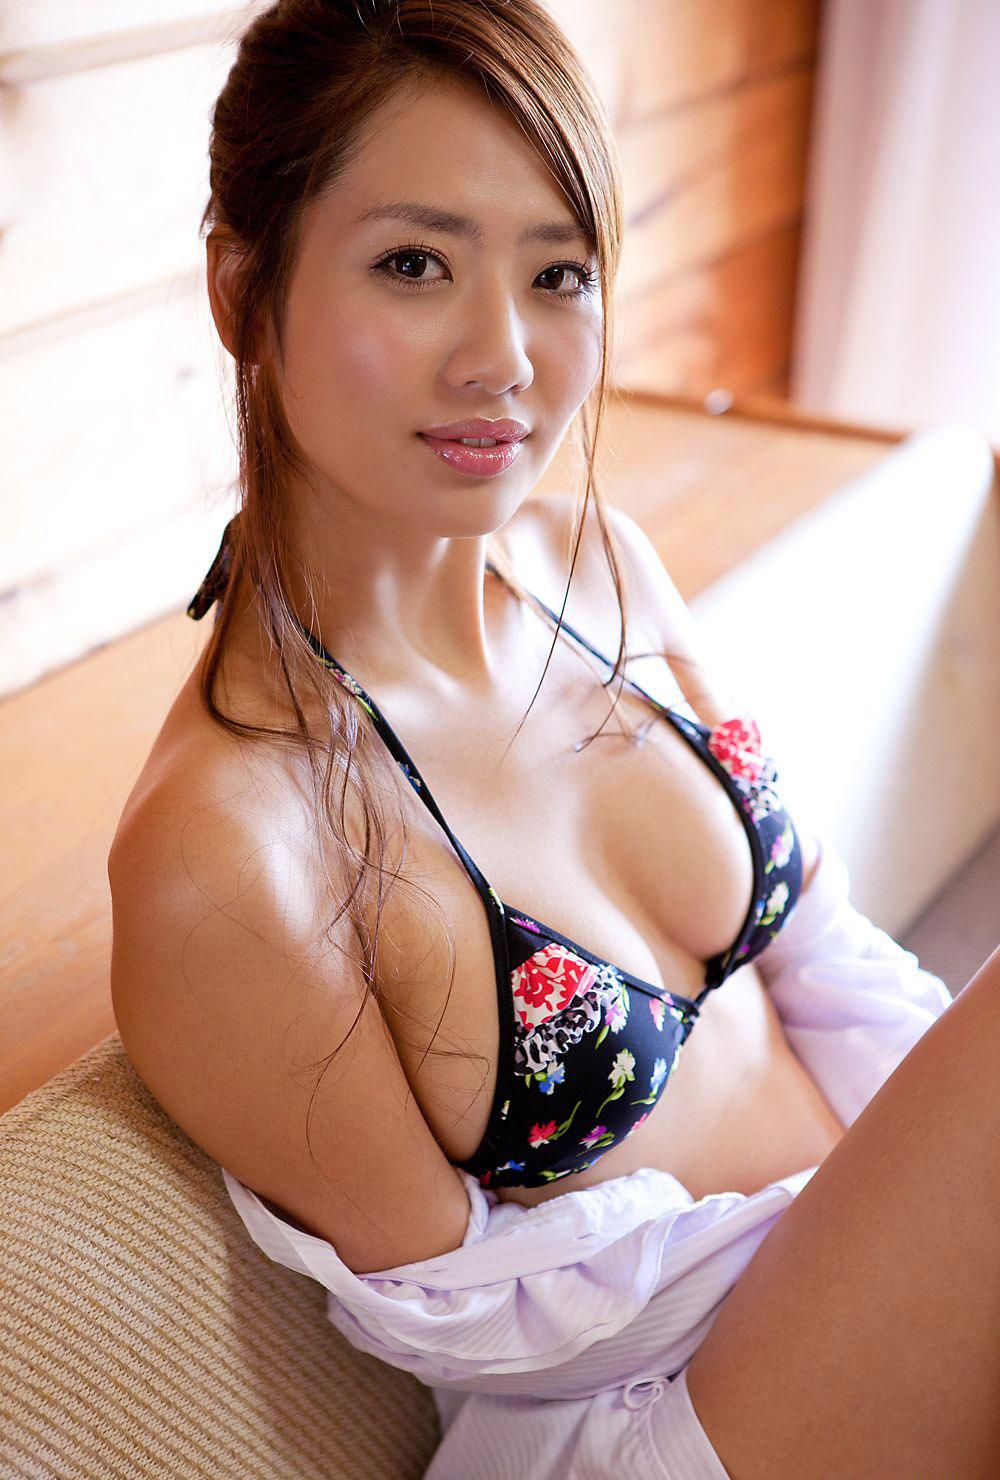 滝川綾 画像 28